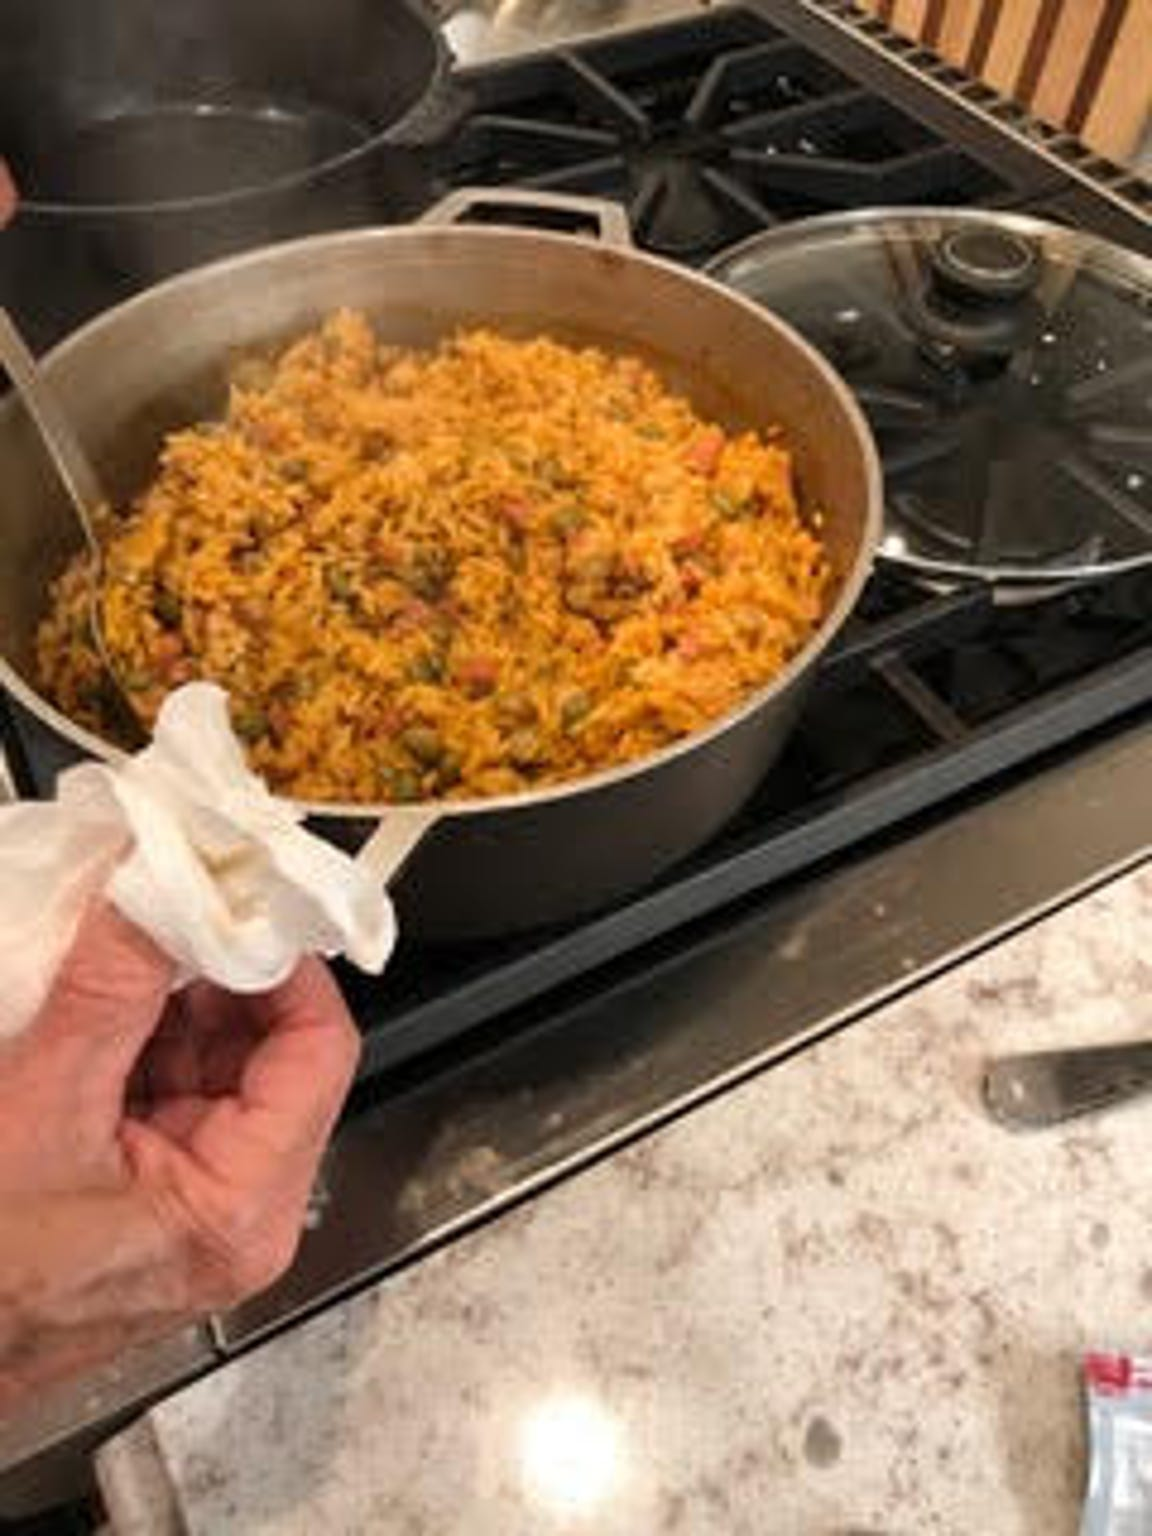 Pigeon pea and rice dish